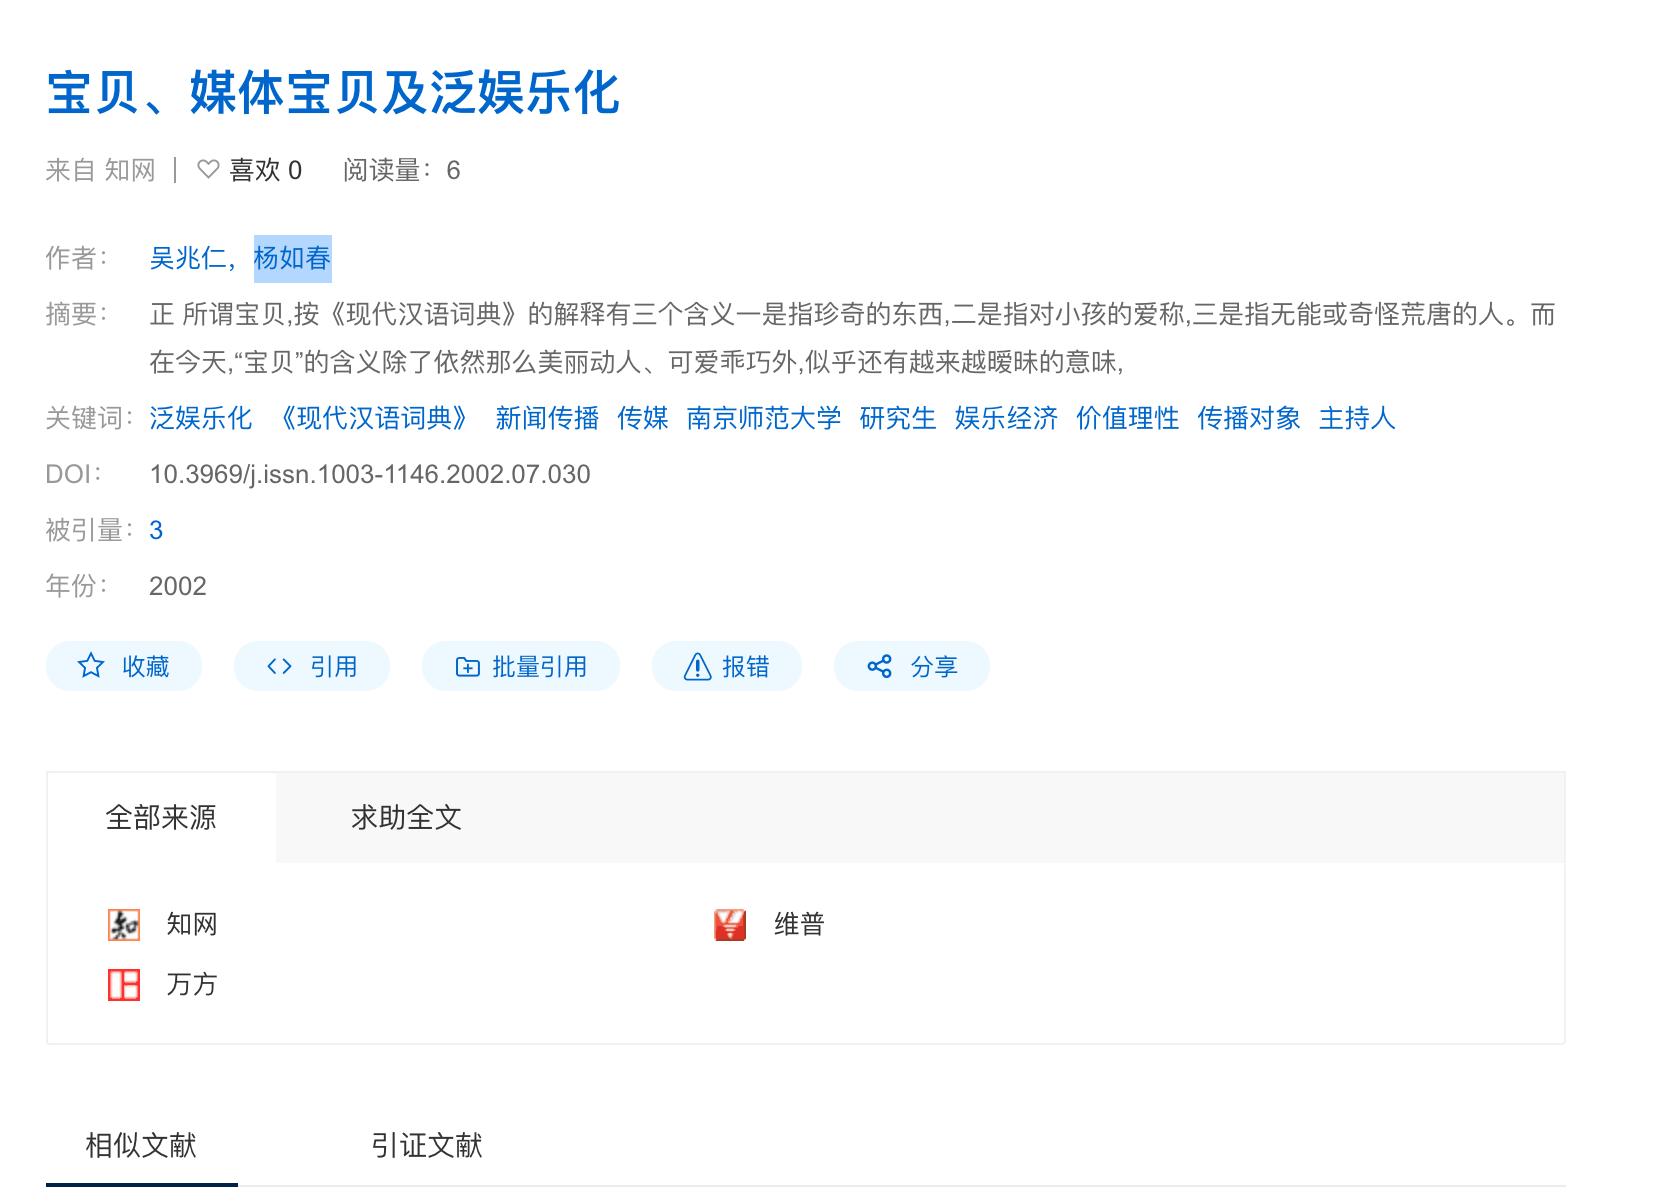 http://yuehanimage.test.upcdn.net/blog/2020-02-16-030616.png